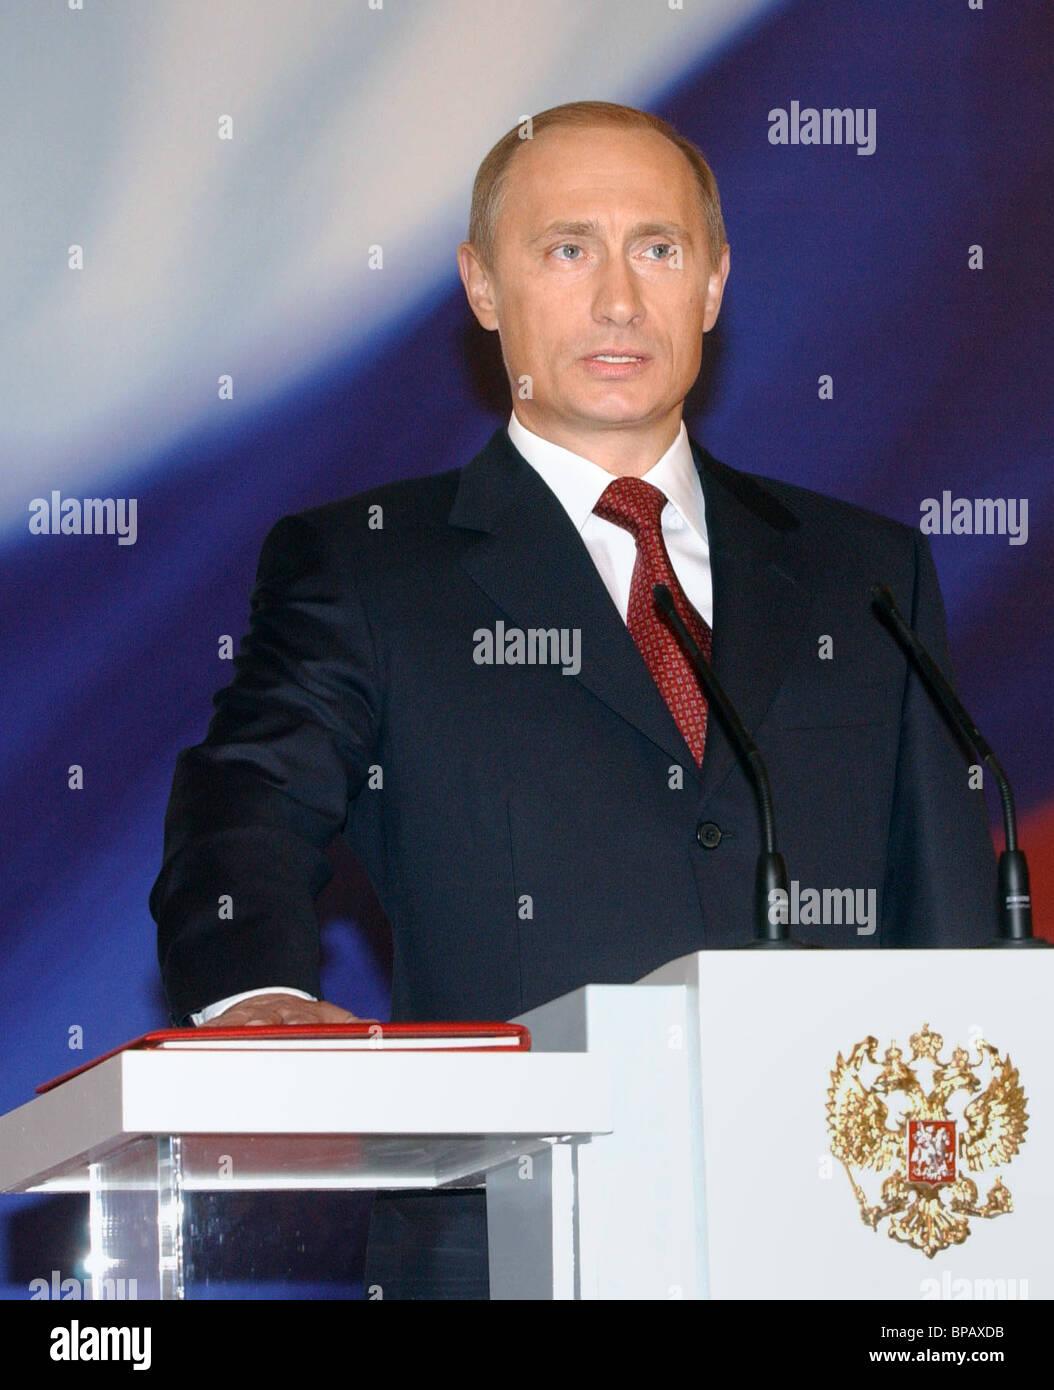 Inauguration Ceremony of President of Russia Vladimir Putin - Stock Image